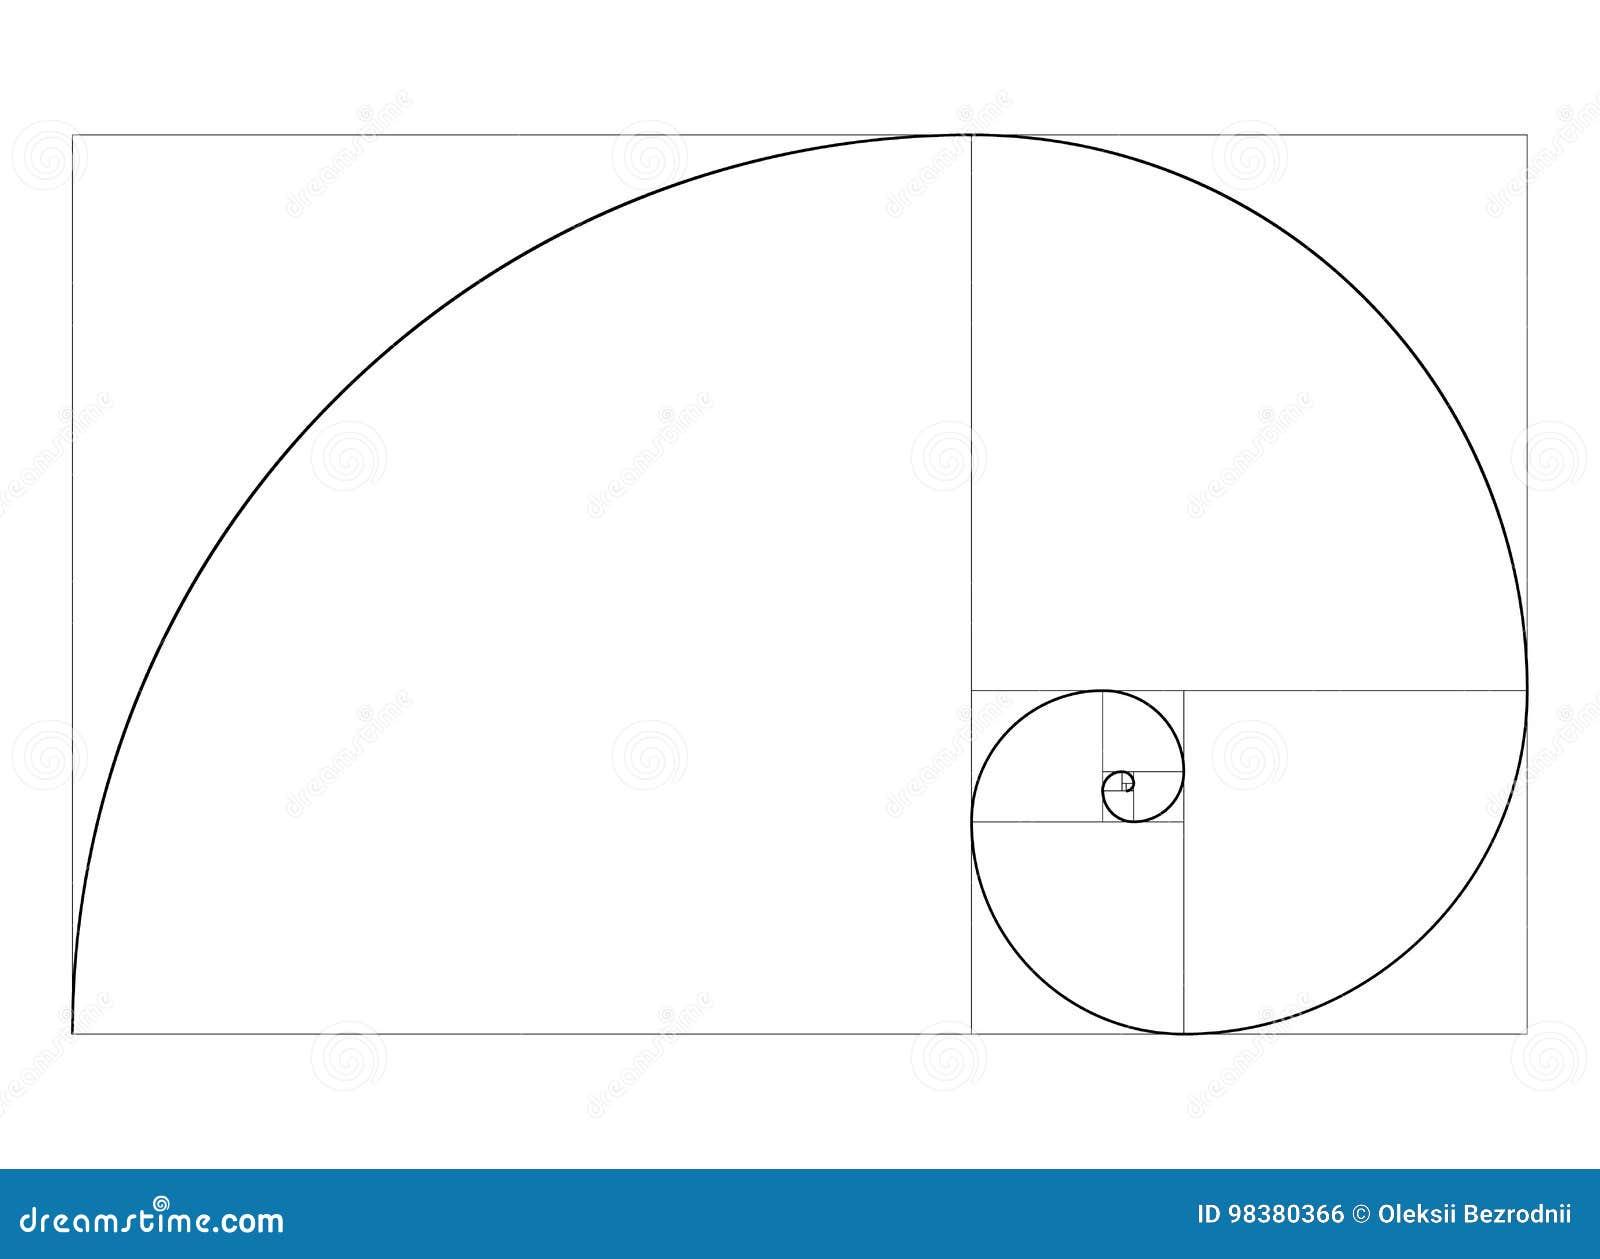 golden ratio template vector stock vector illustration of ideal